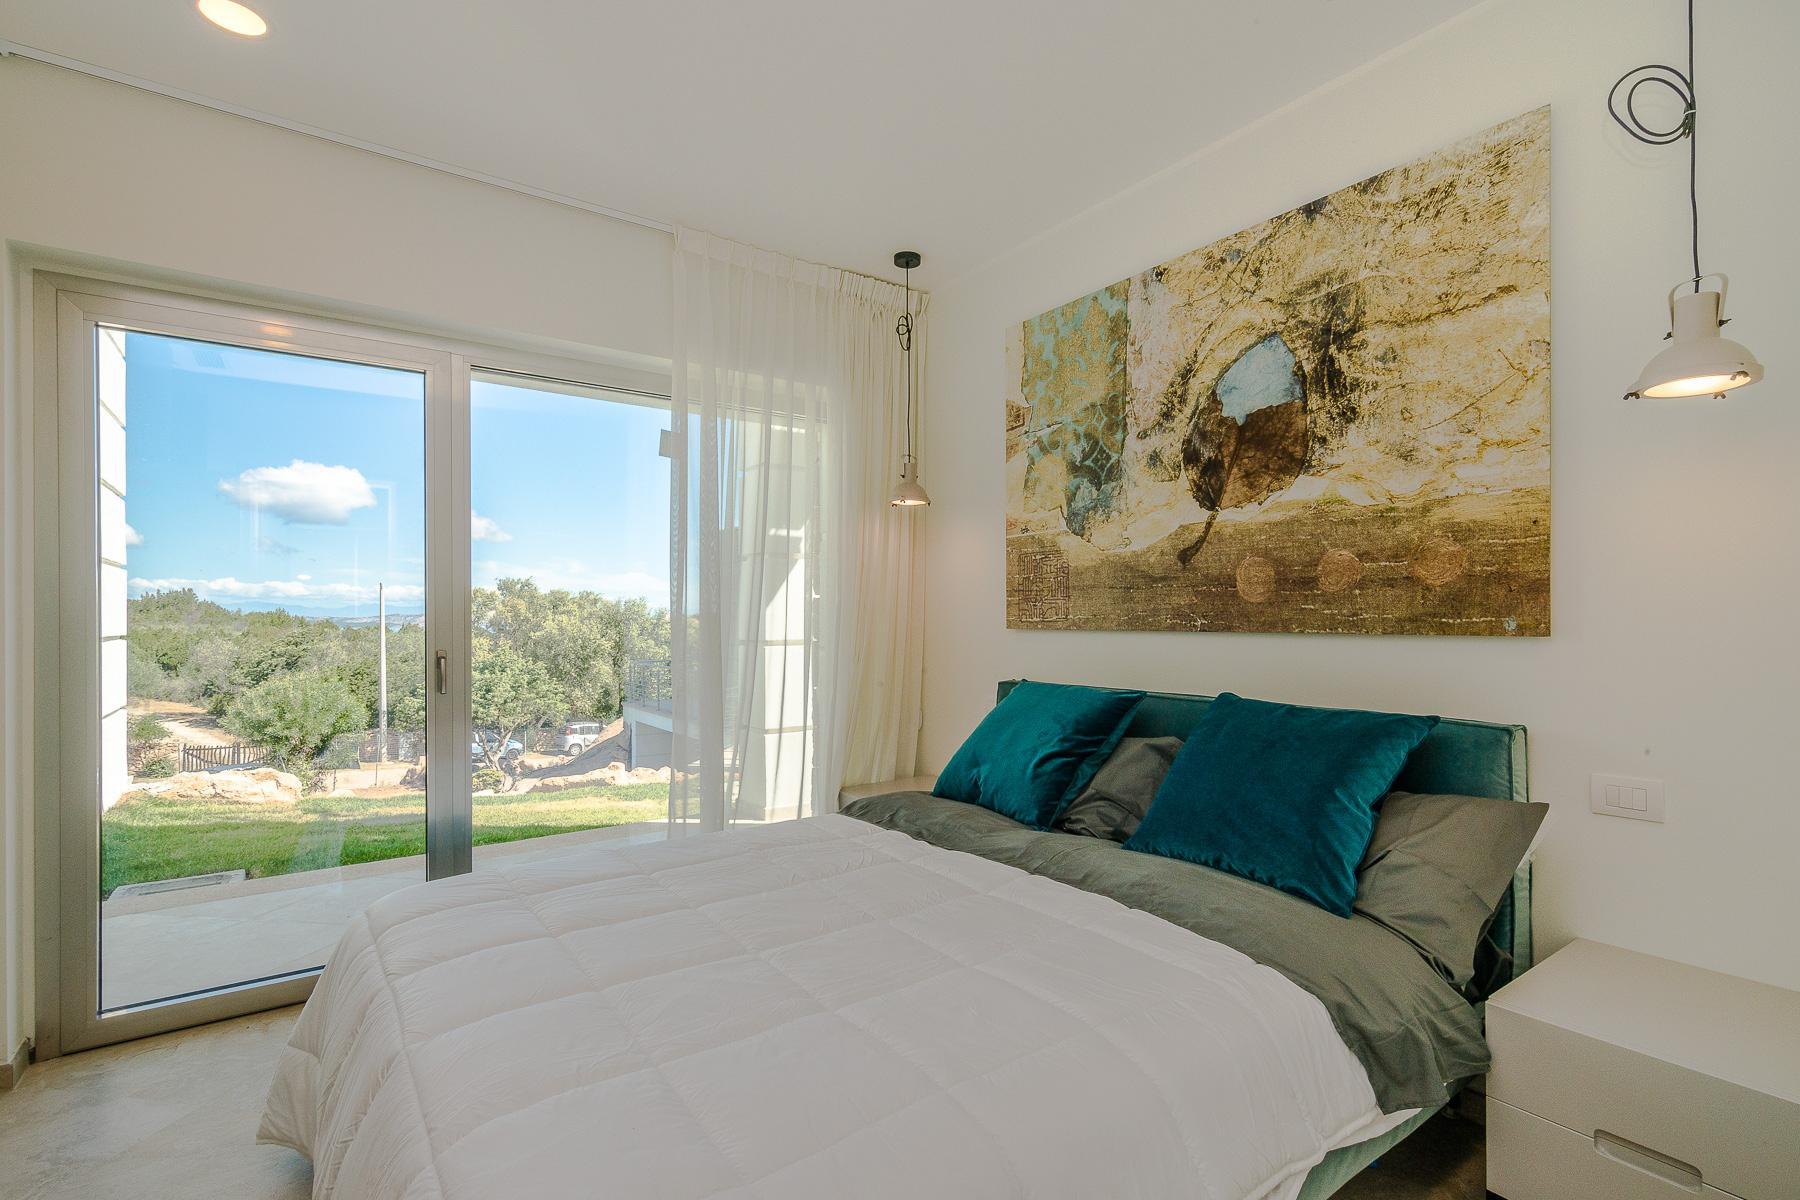 Pegasus Gorgeus Villa with swimming pool immersed in mediterranean fragrances - 7